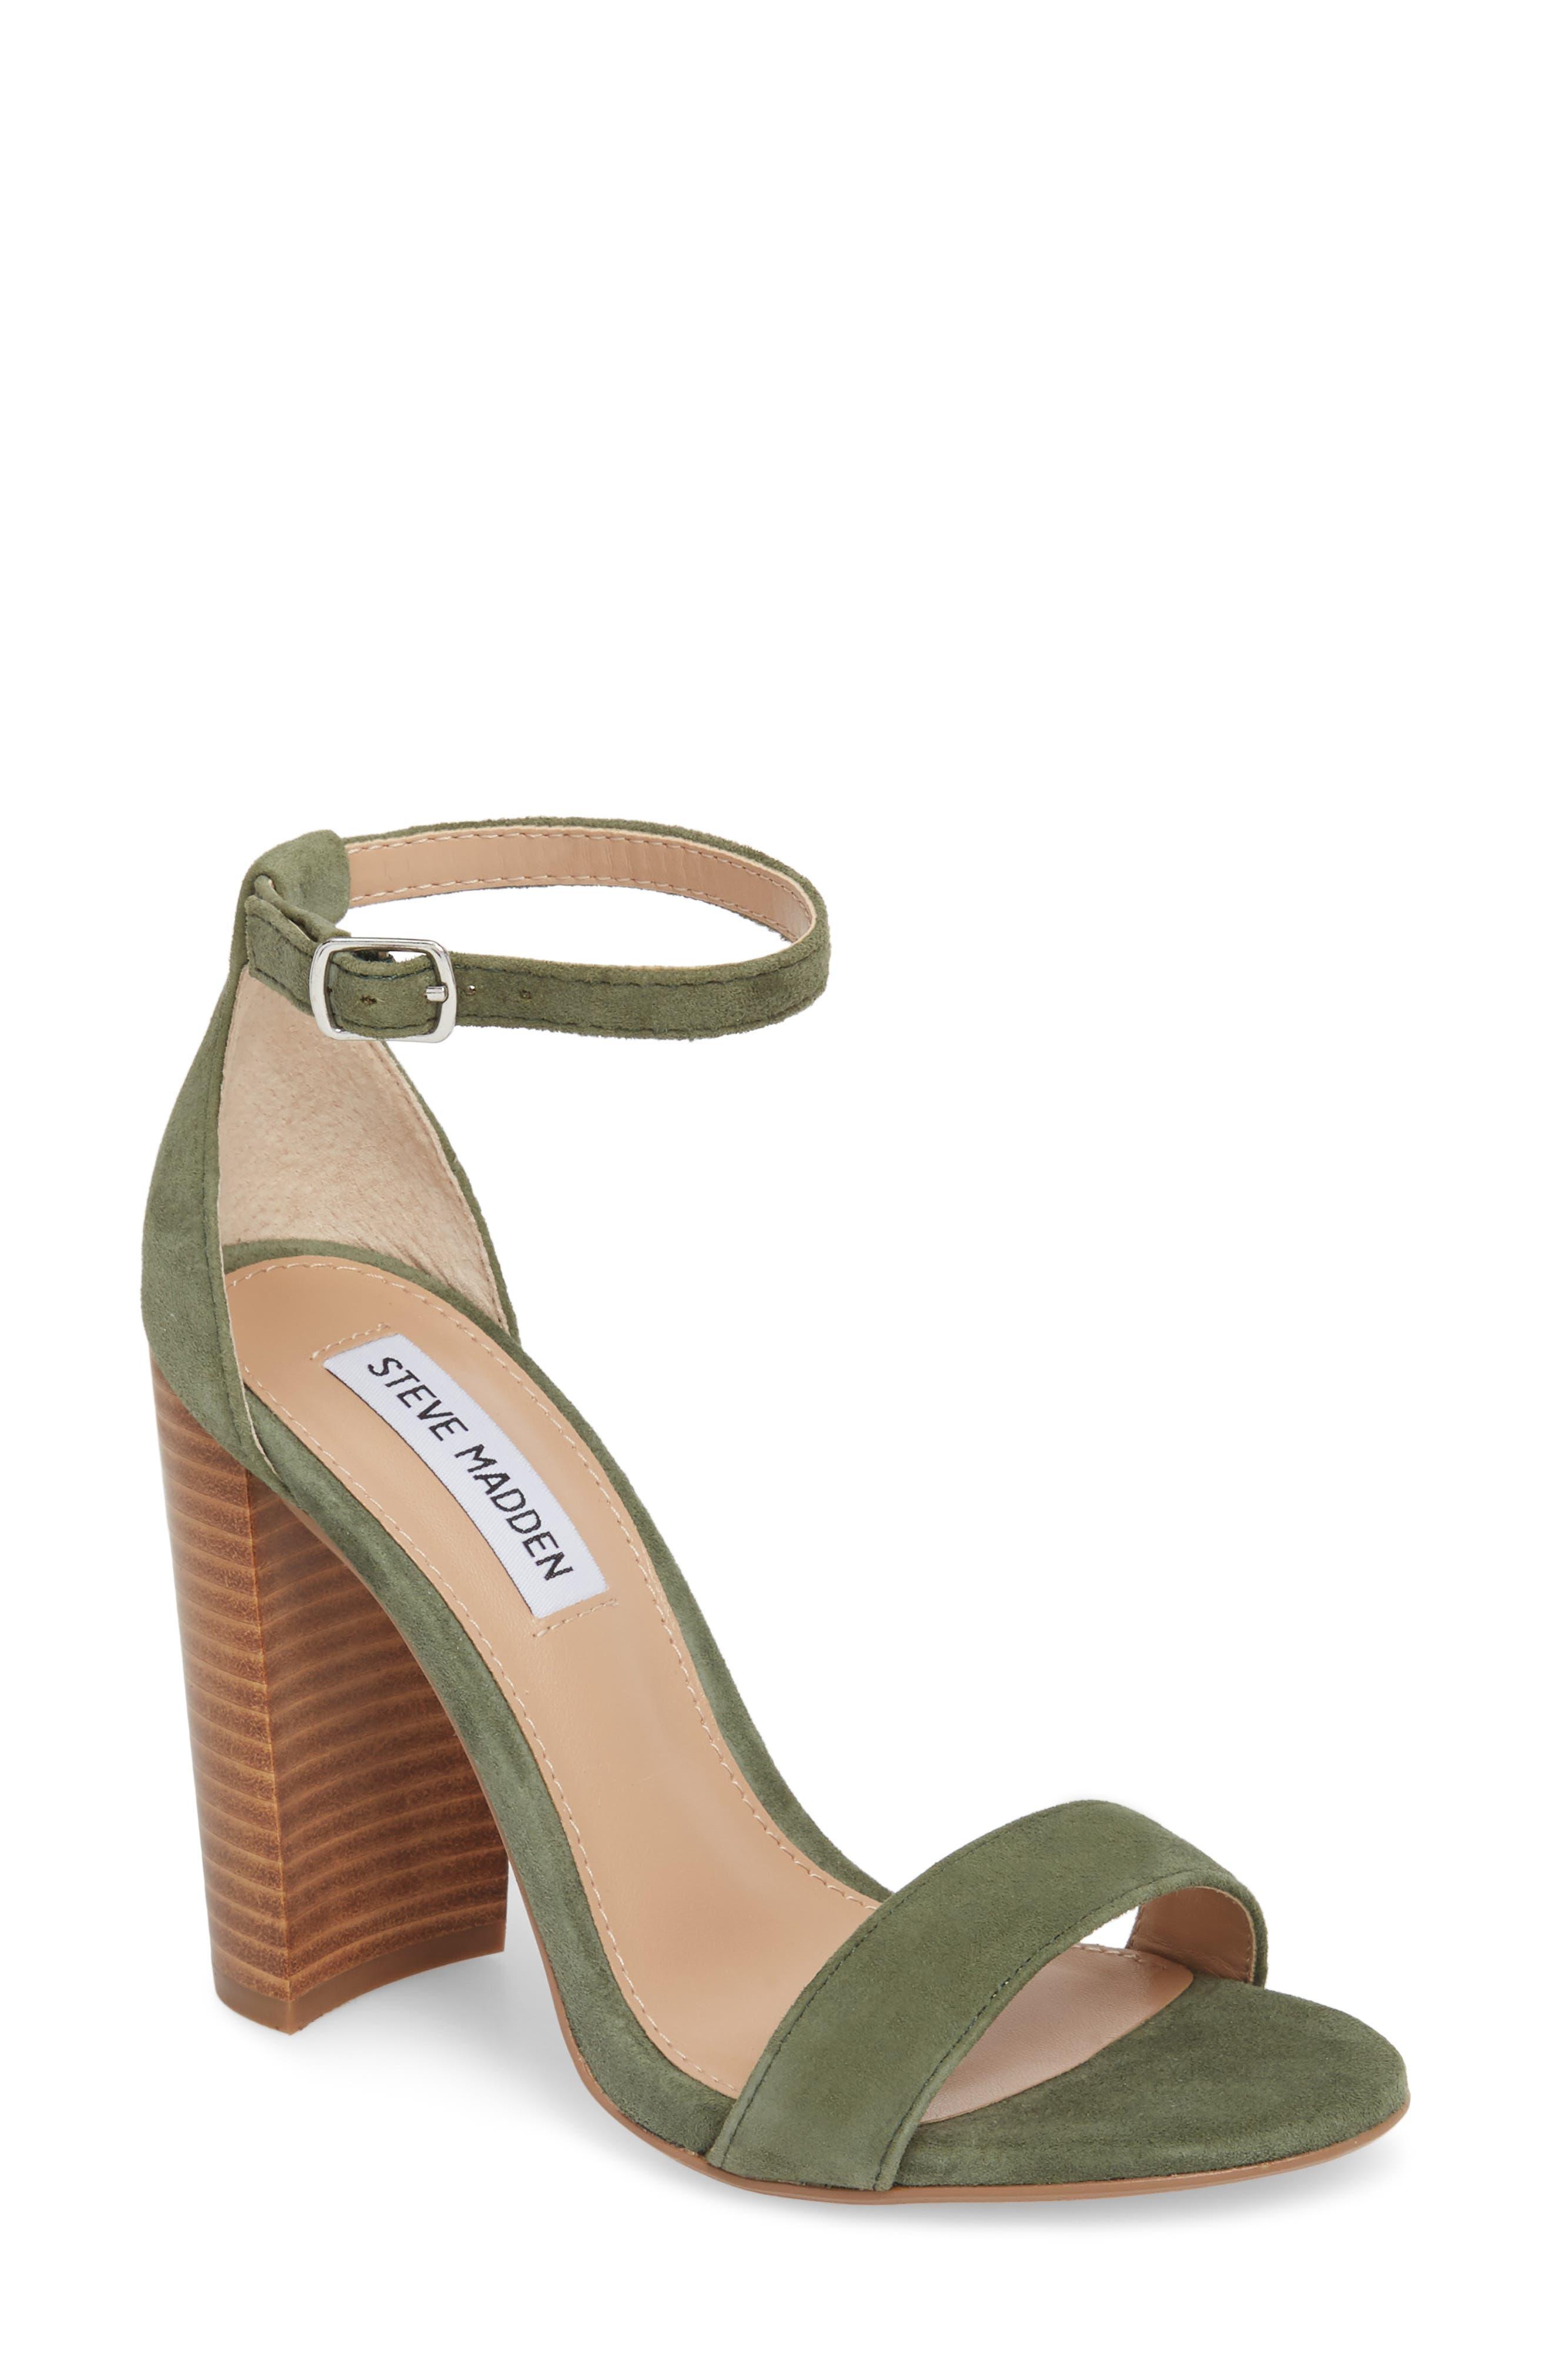 Carrson Sandal,                         Main,                         color, Olive Multi